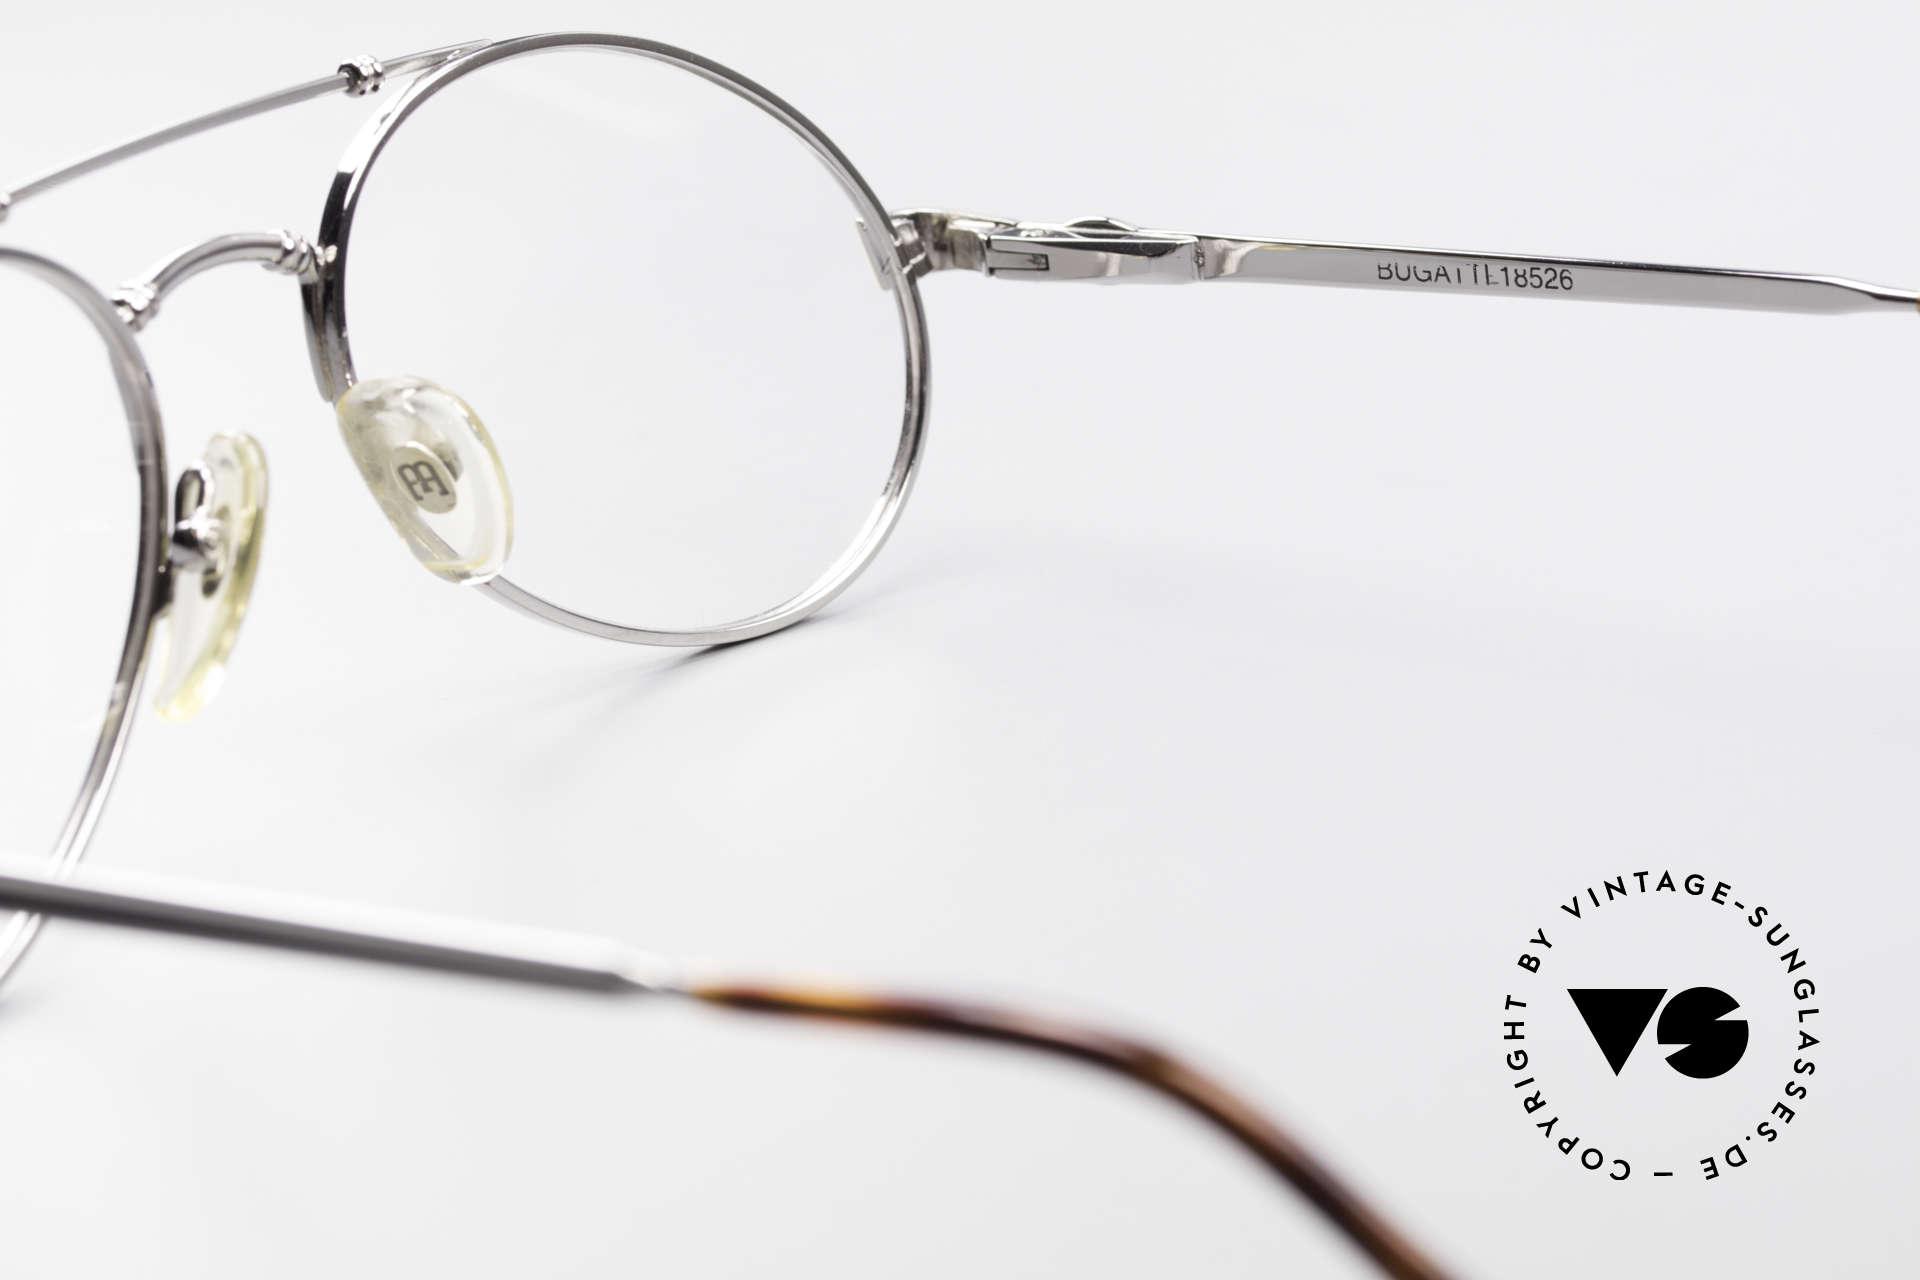 Bugatti 18526 Men's 80's Luxury Eyeglasses, NO RETRO EYEWEAR, but a precious old ORIGINAL, Made for Men